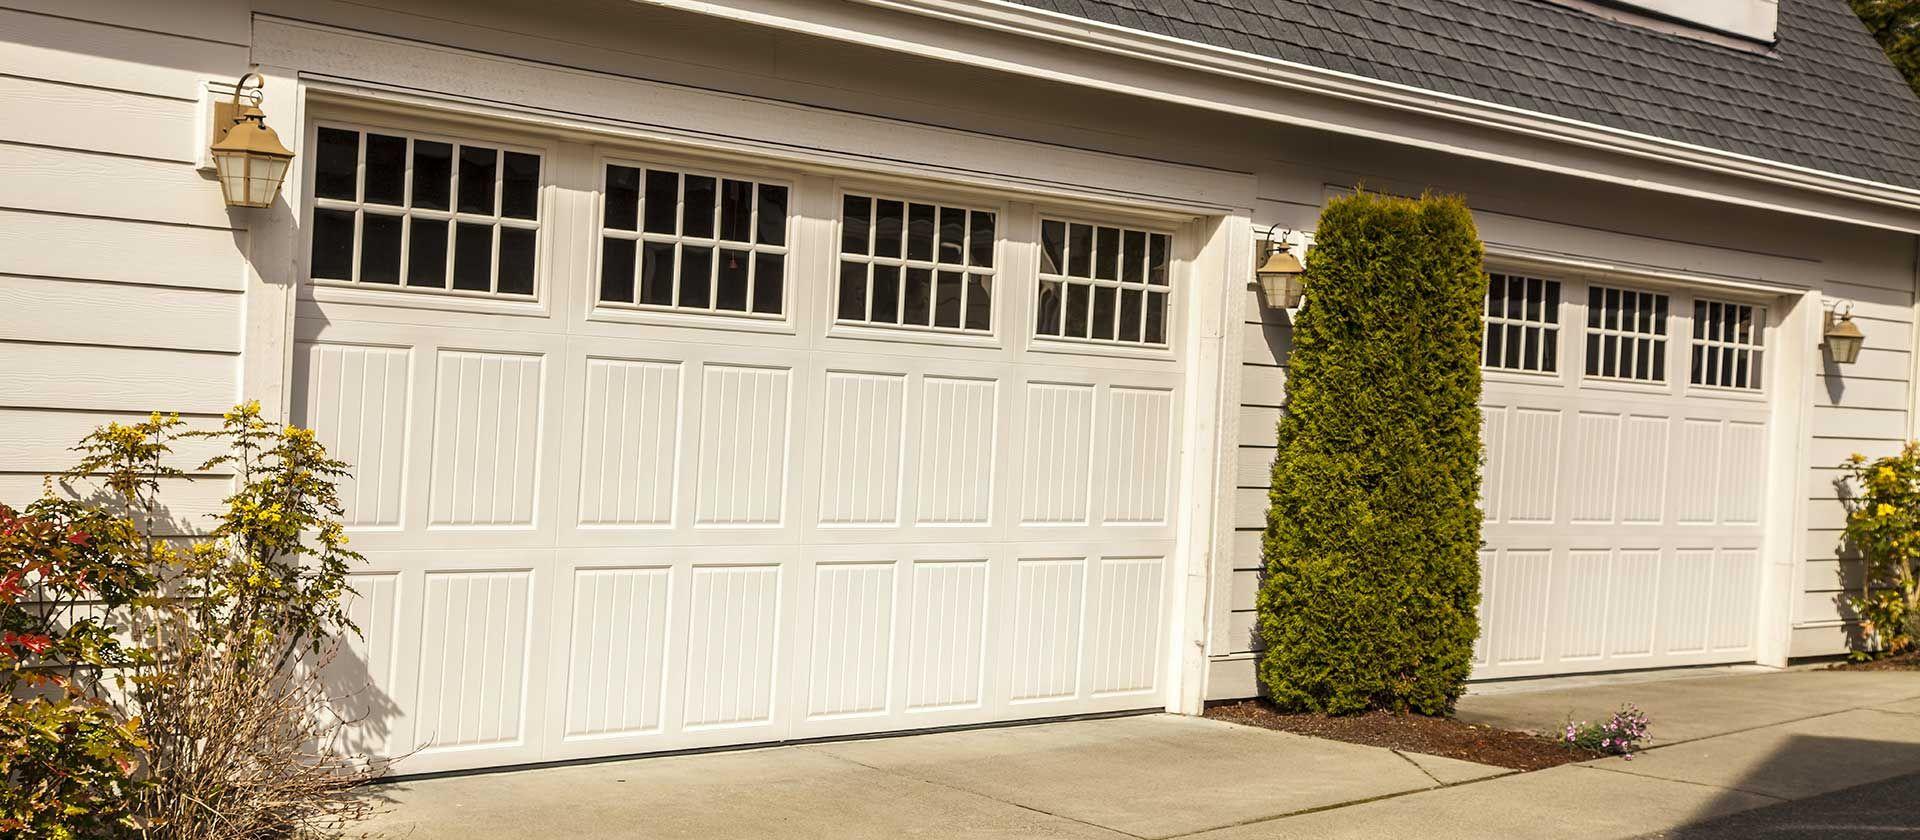 Valley Stream Ny Garage Door Repair Installation Opener Company Garage Door Installation Door Repair Garage Door Repair